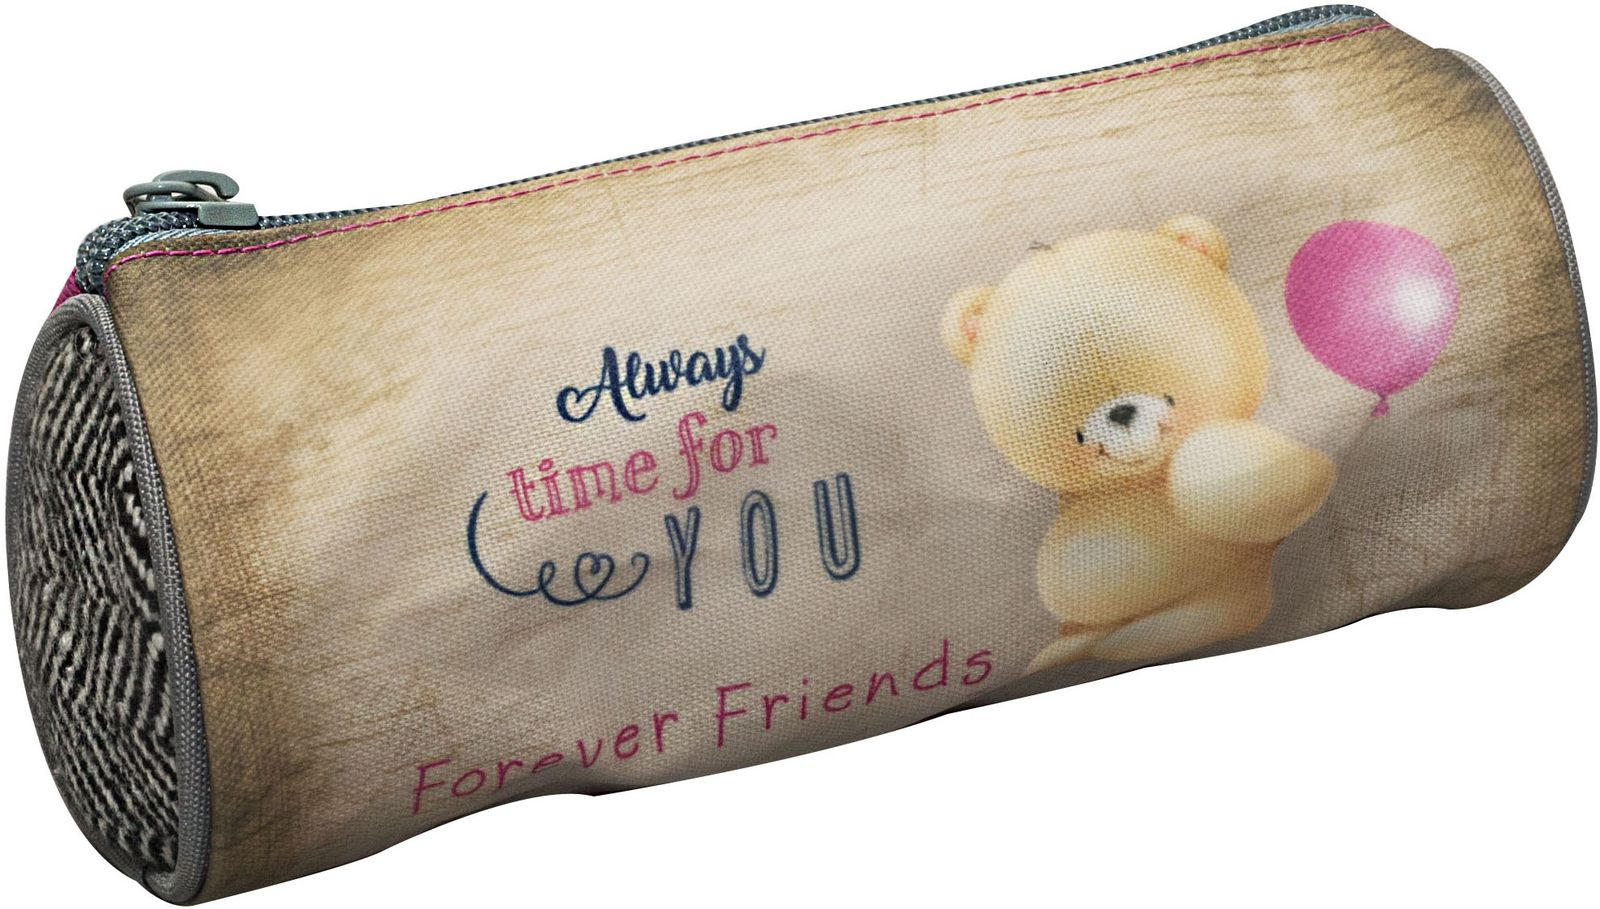 5ef94d0451 Κασετίνα Βαρελάκι Forever Friends Tweed BMU 333-40140